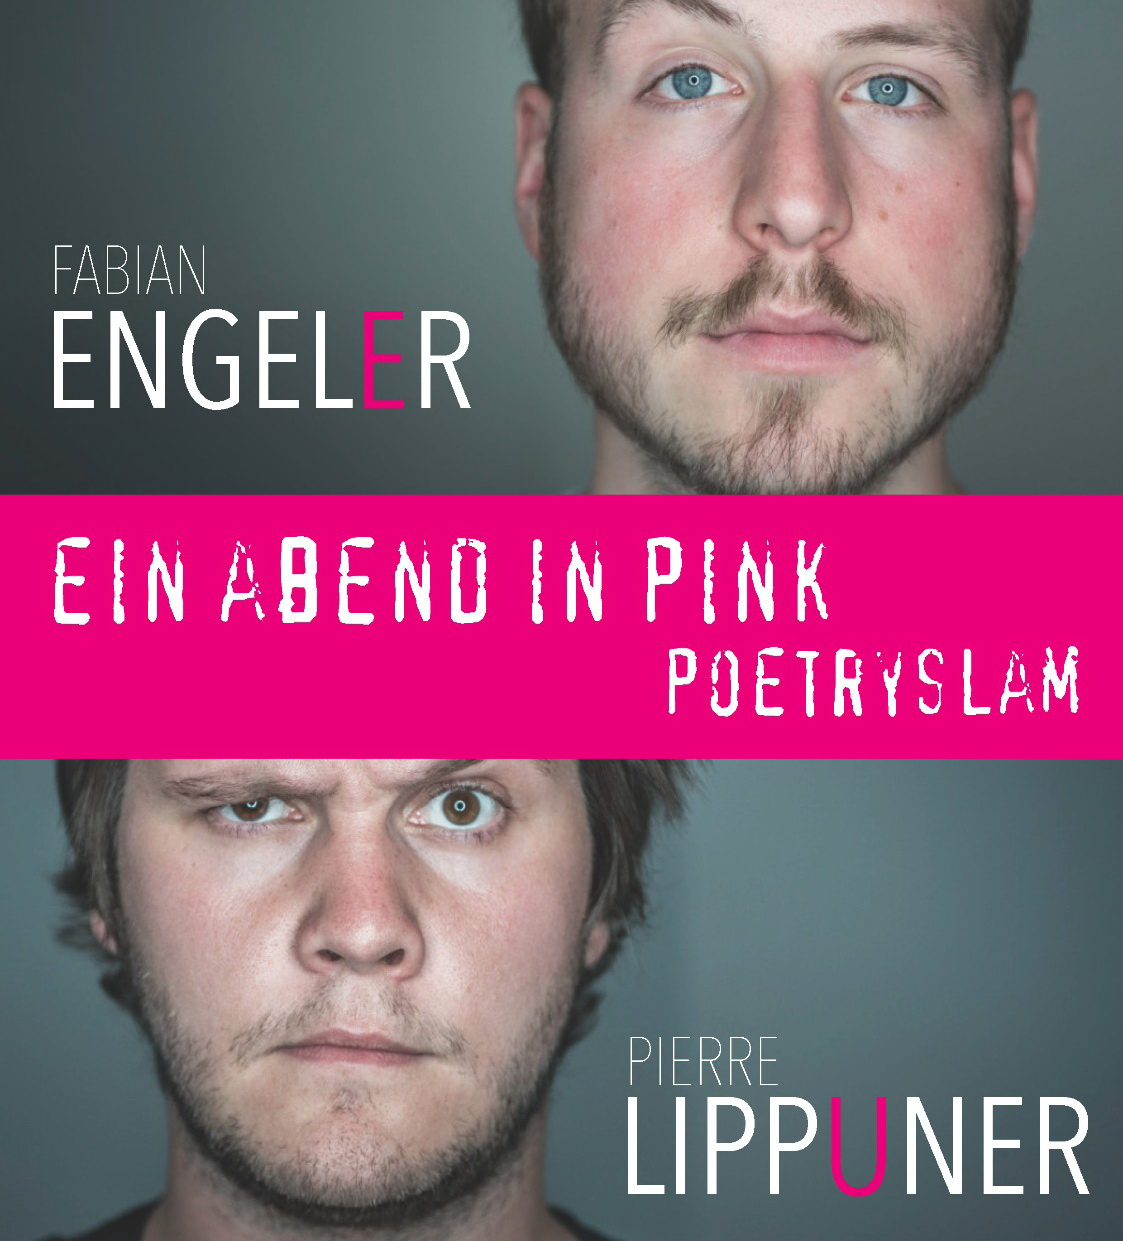 Fabian Engeler & Pierre Lippuner